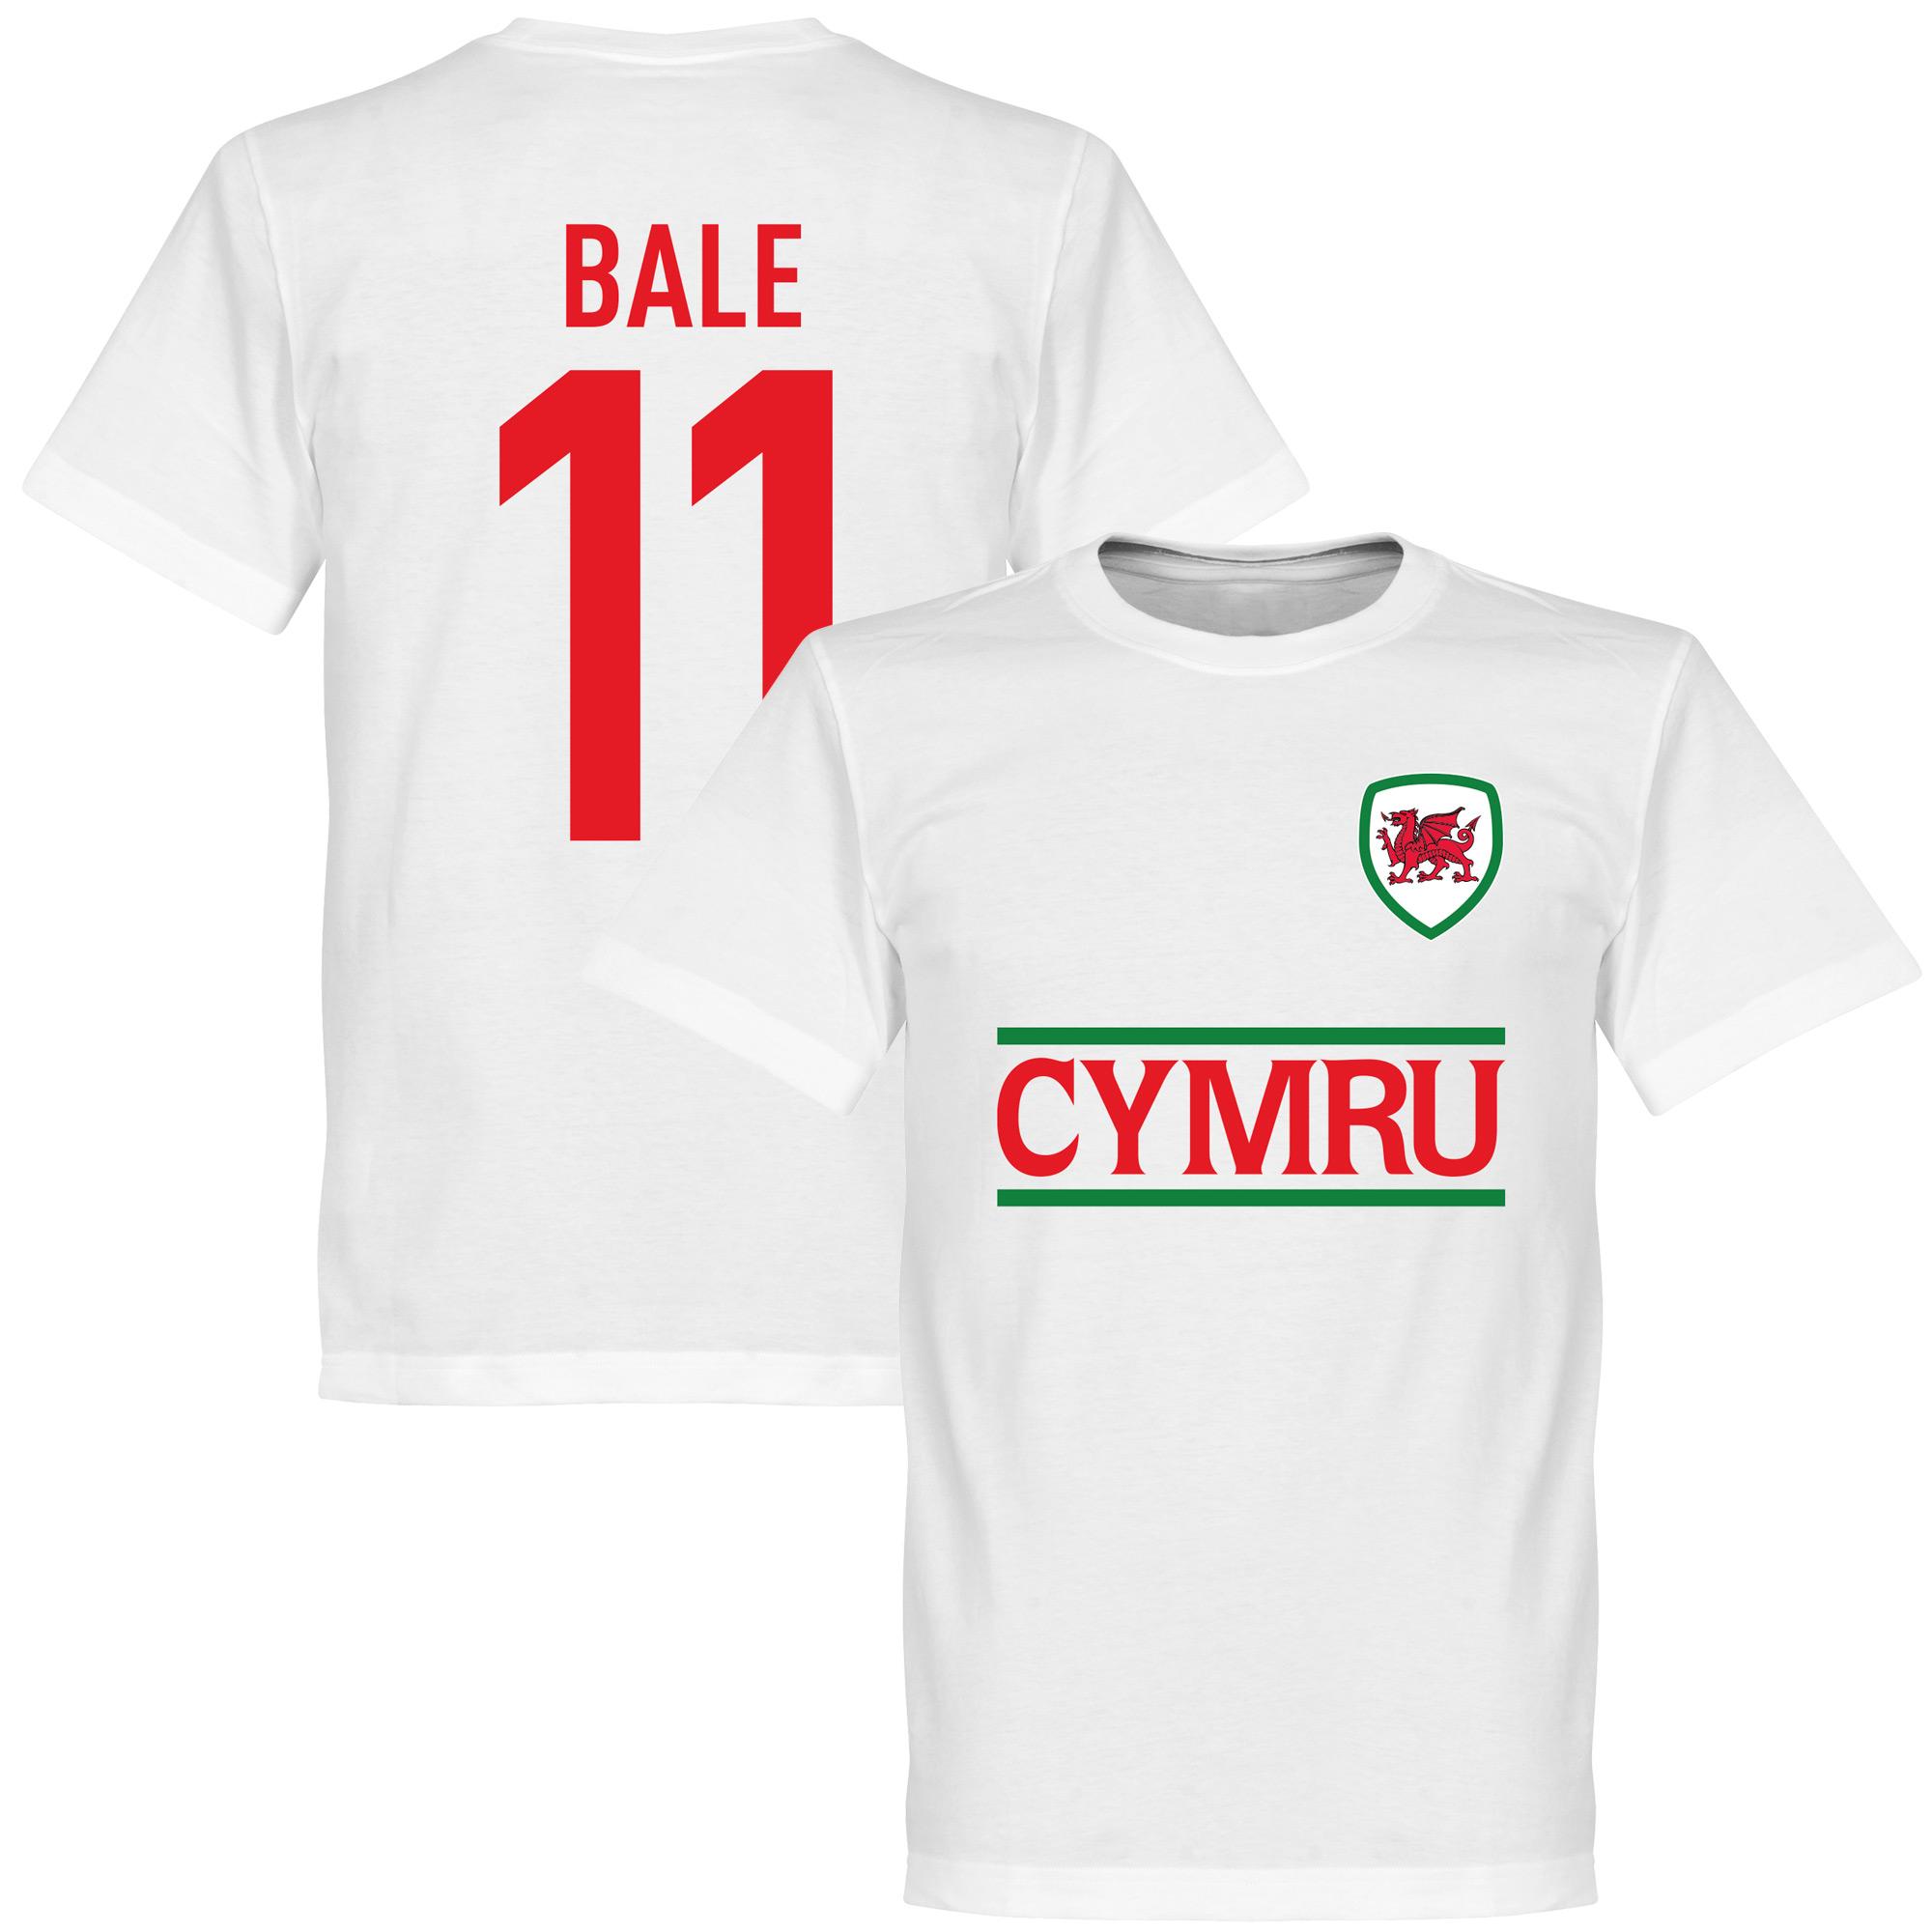 Cymru Bale Team Tee - White - L